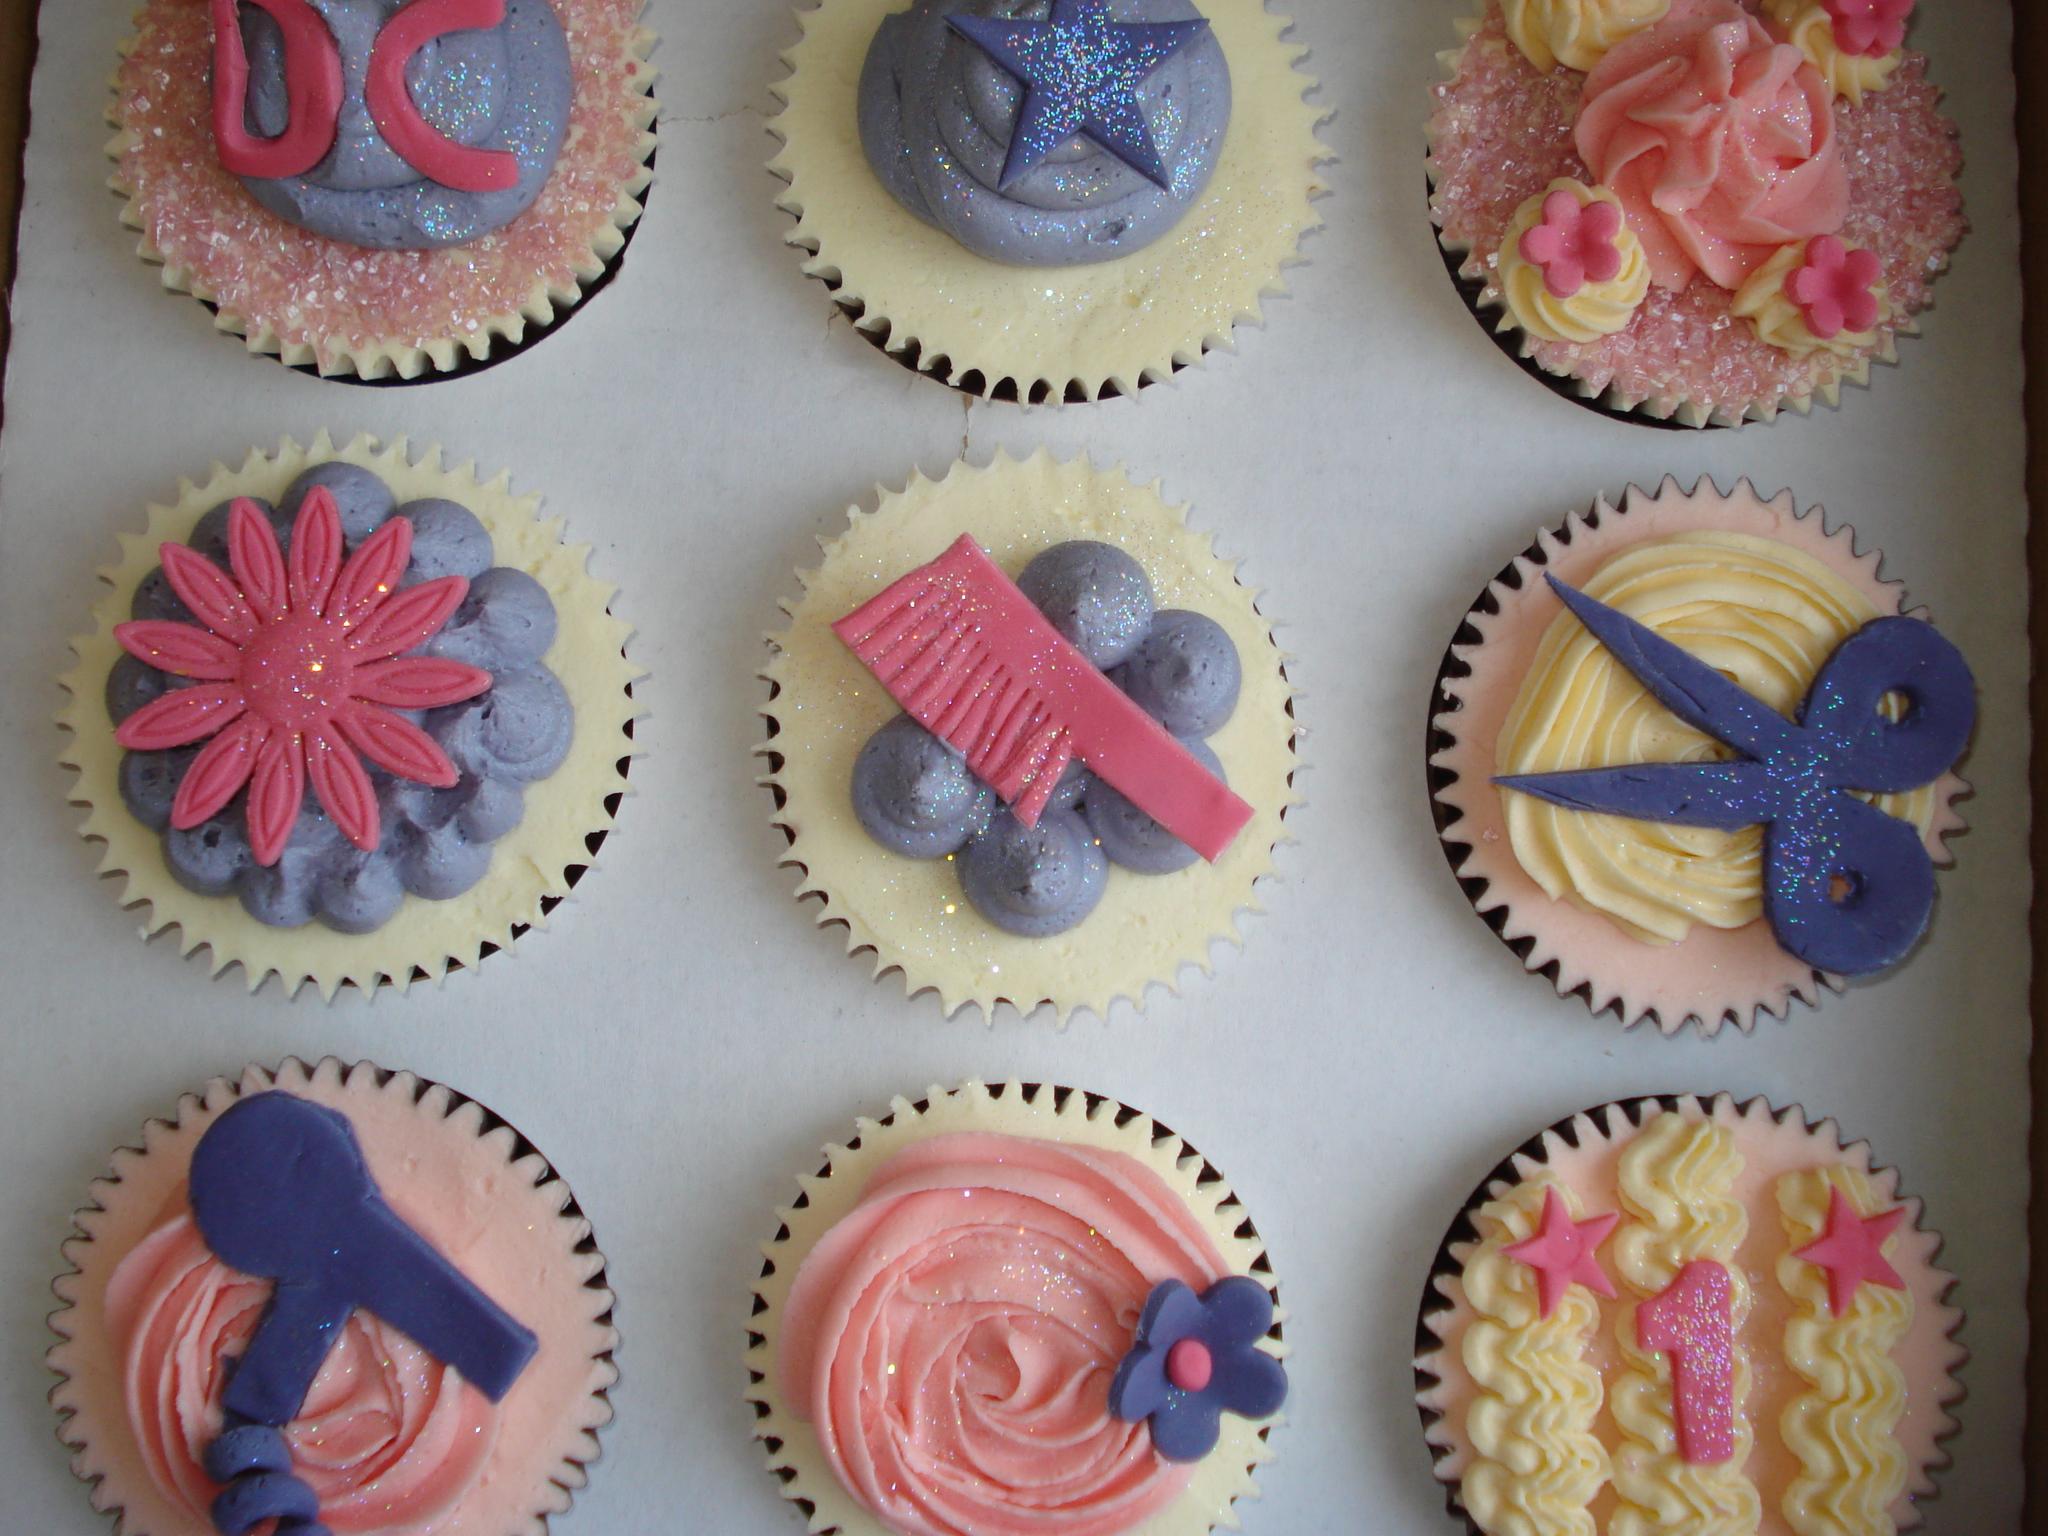 More hairsalon cupcakes